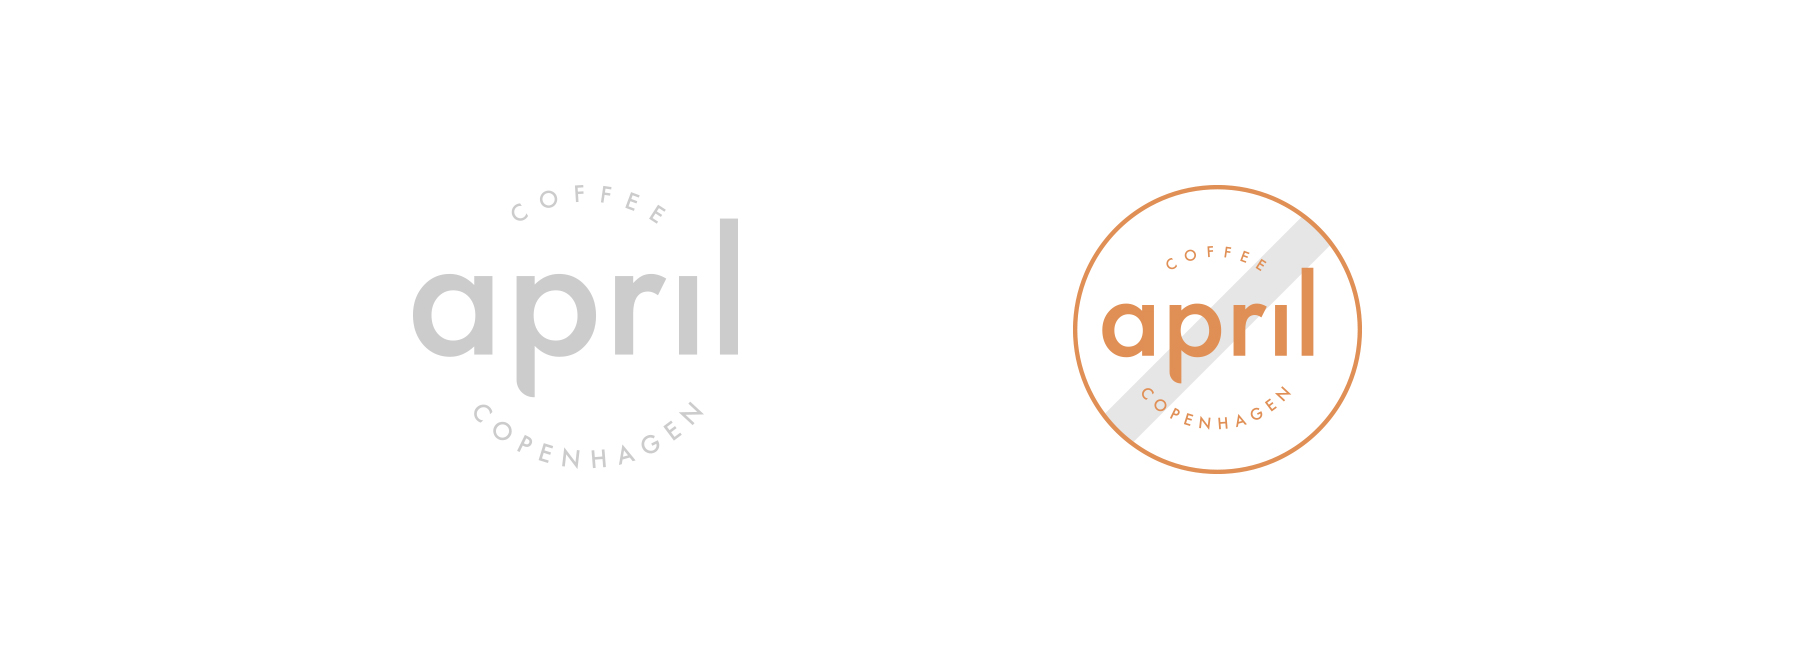 april-coffee-roasters-copenhagen-design-by-max-duchardt-m-a-a-x-branding-logo